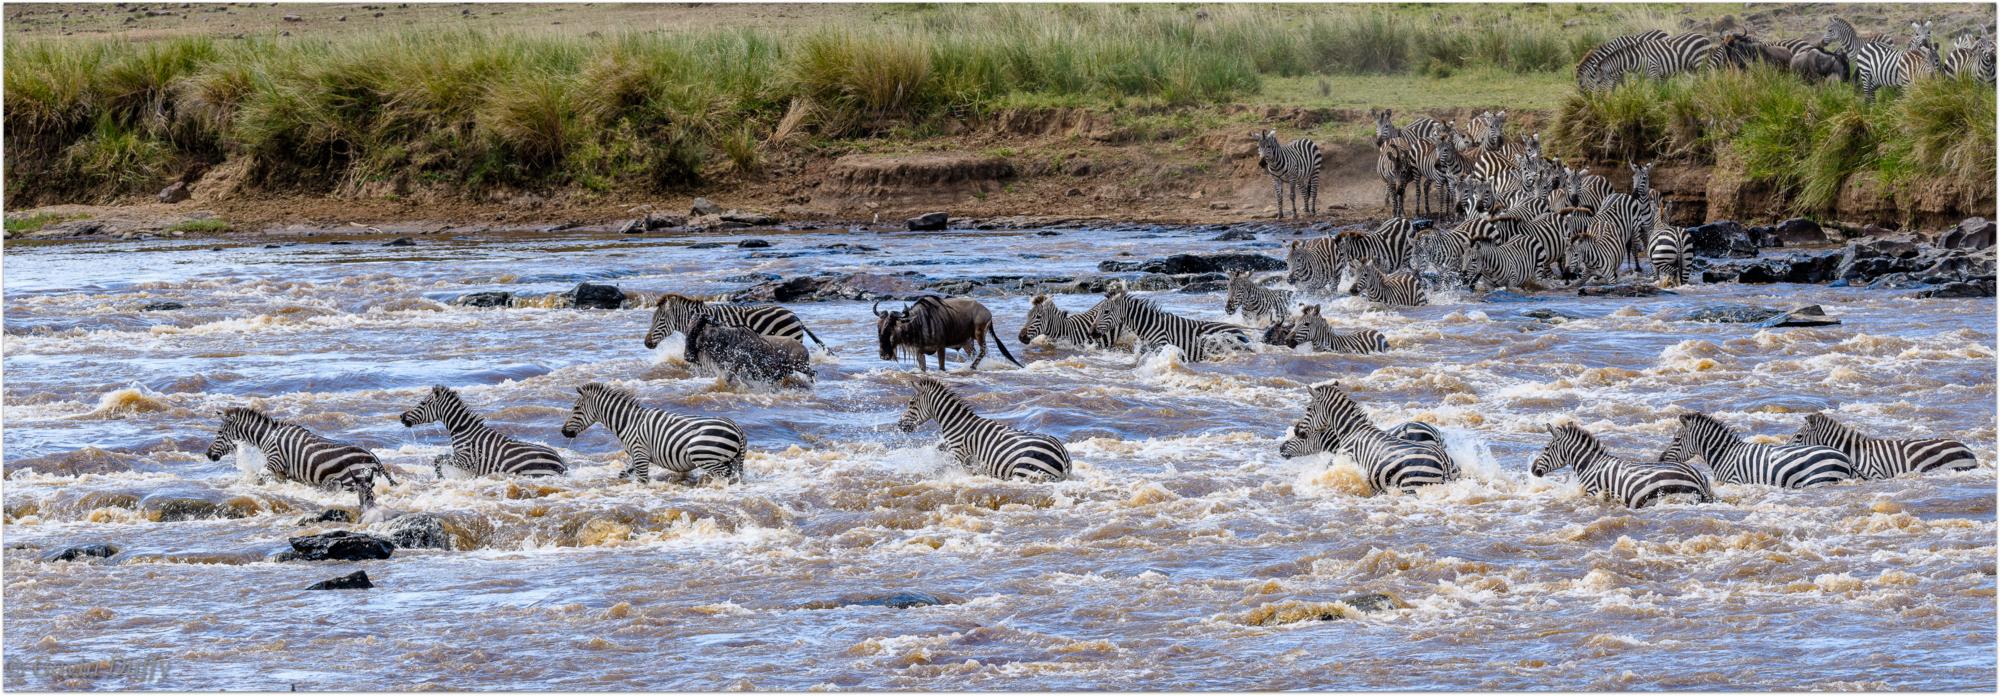 Zebra and wildebeest cross the Mara River © Gavin Duffy